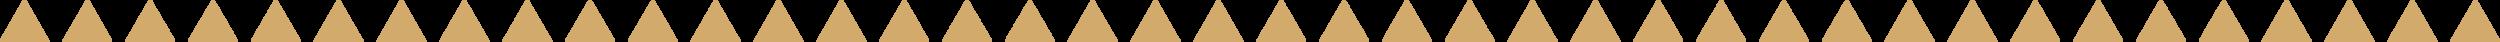 Tribal Shaman-Design-Kit-42.png